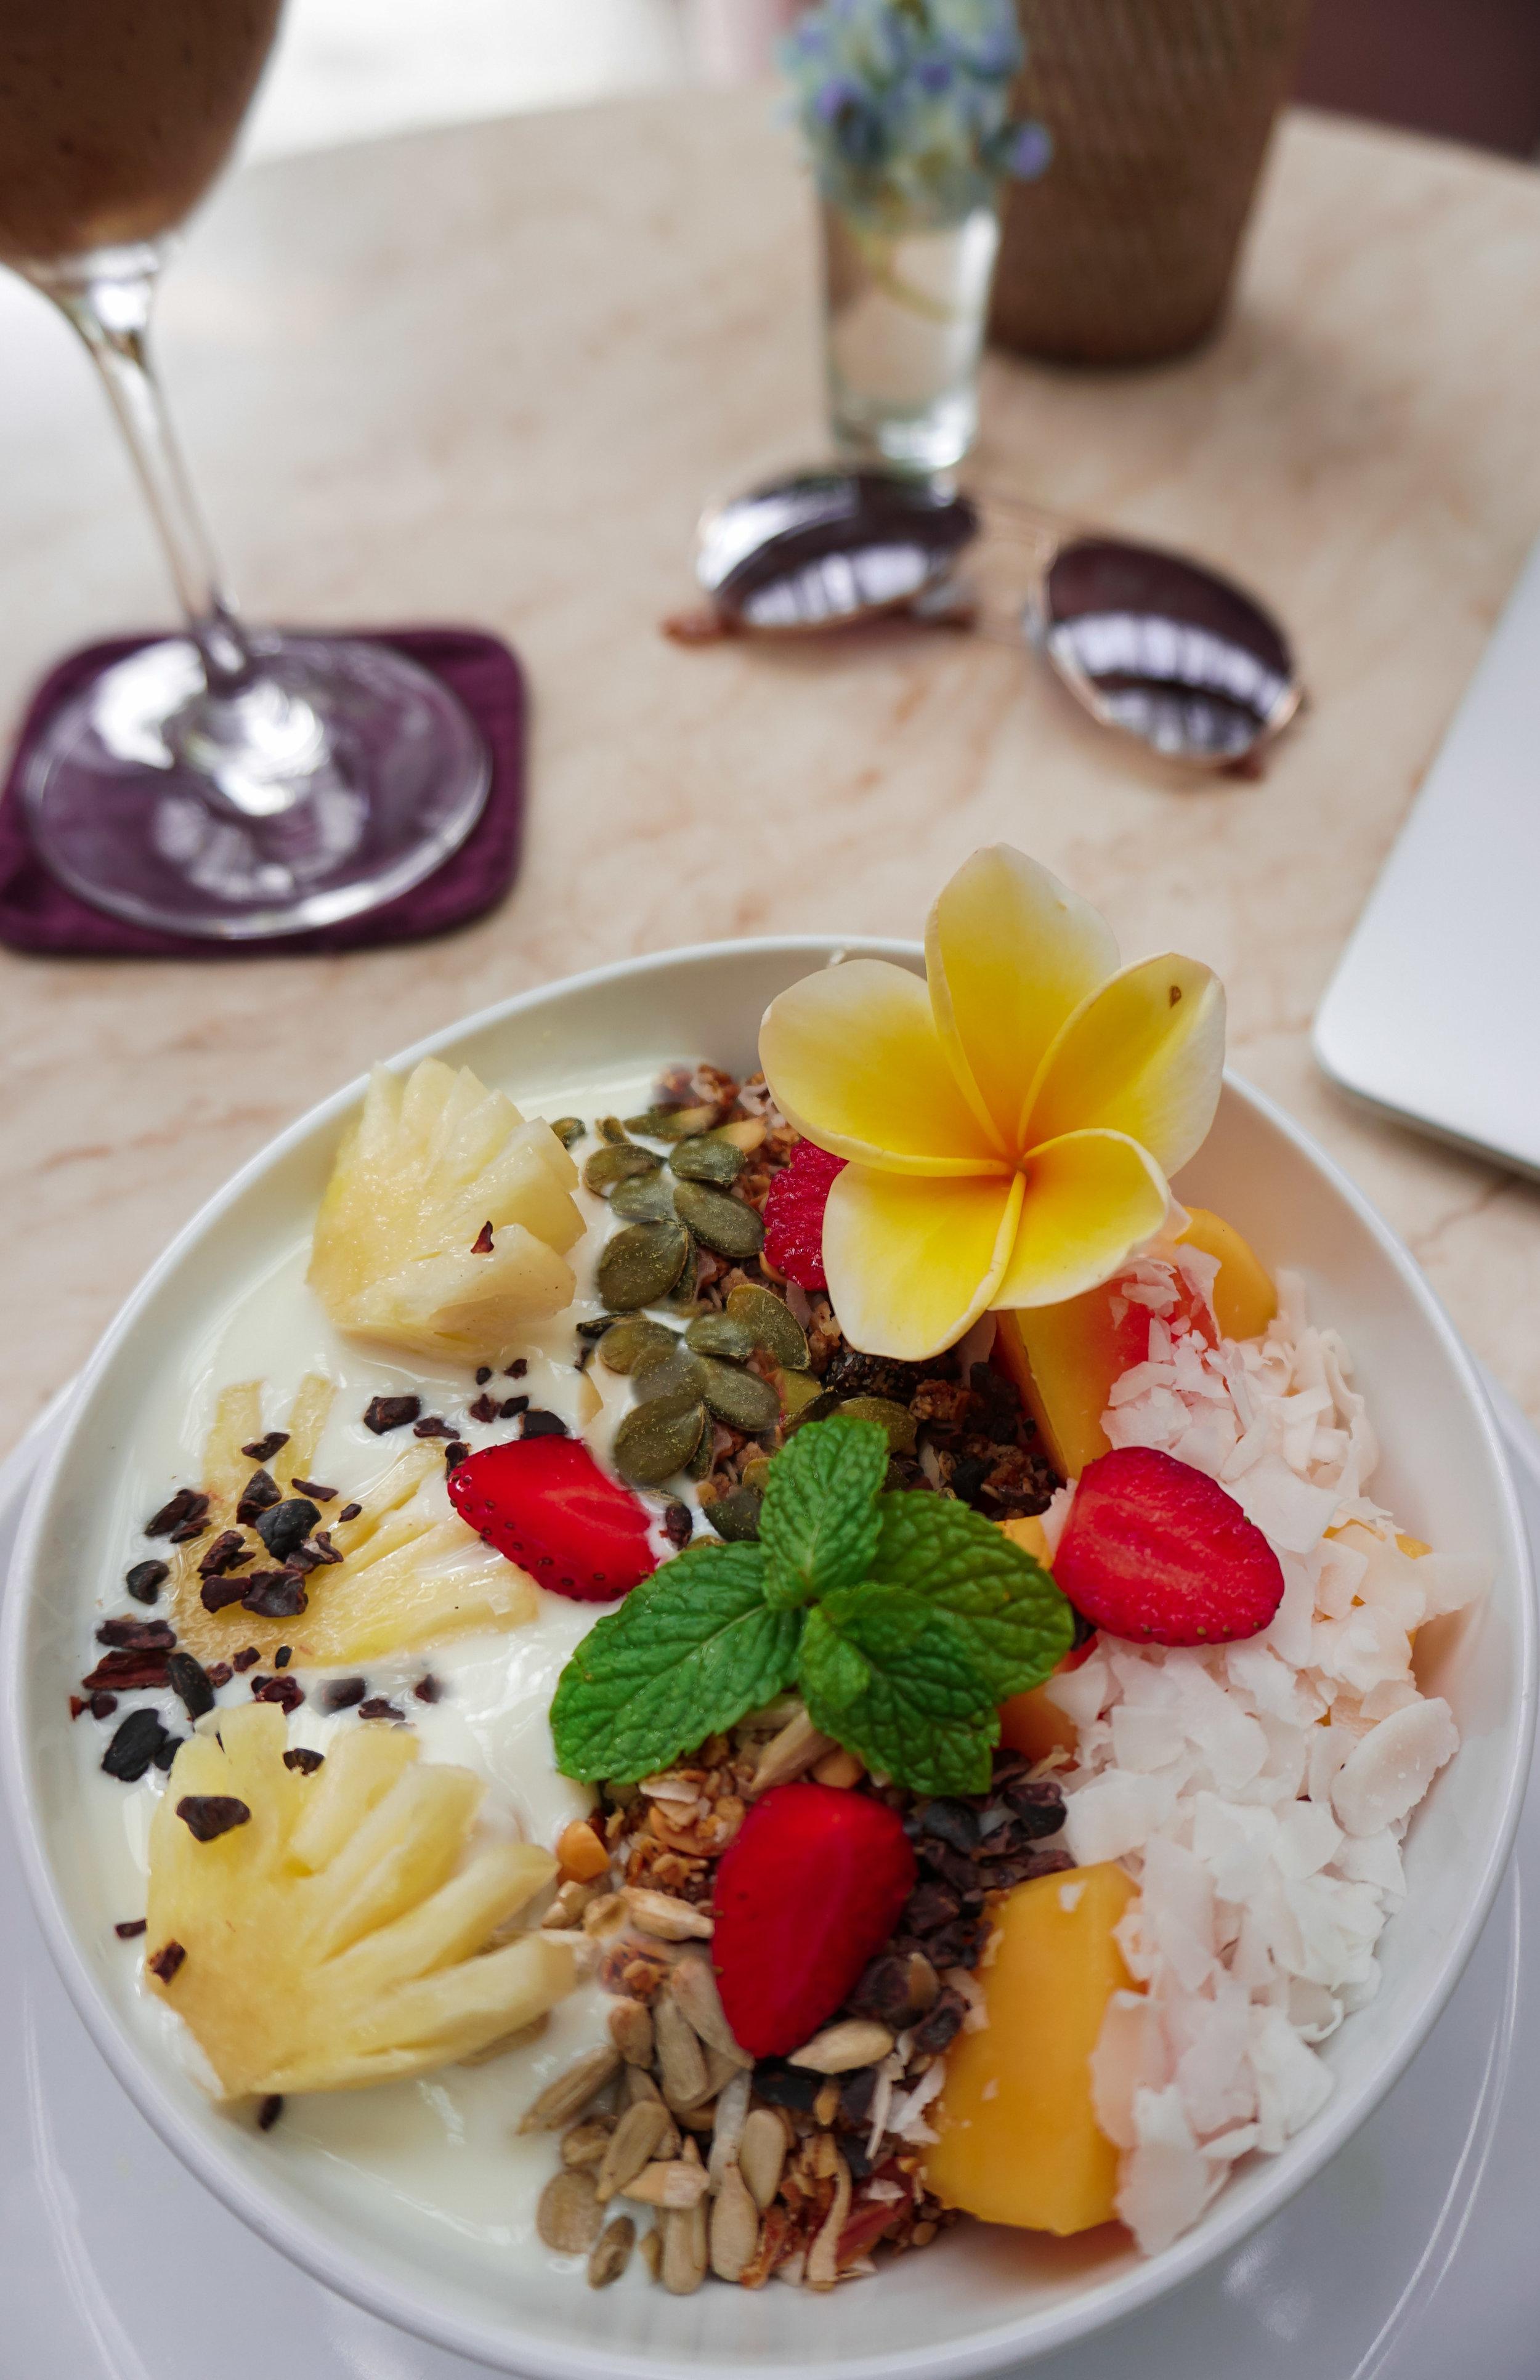 curio.trips.indonesia.bali.food.granola.bowl.portrait-2.jpg